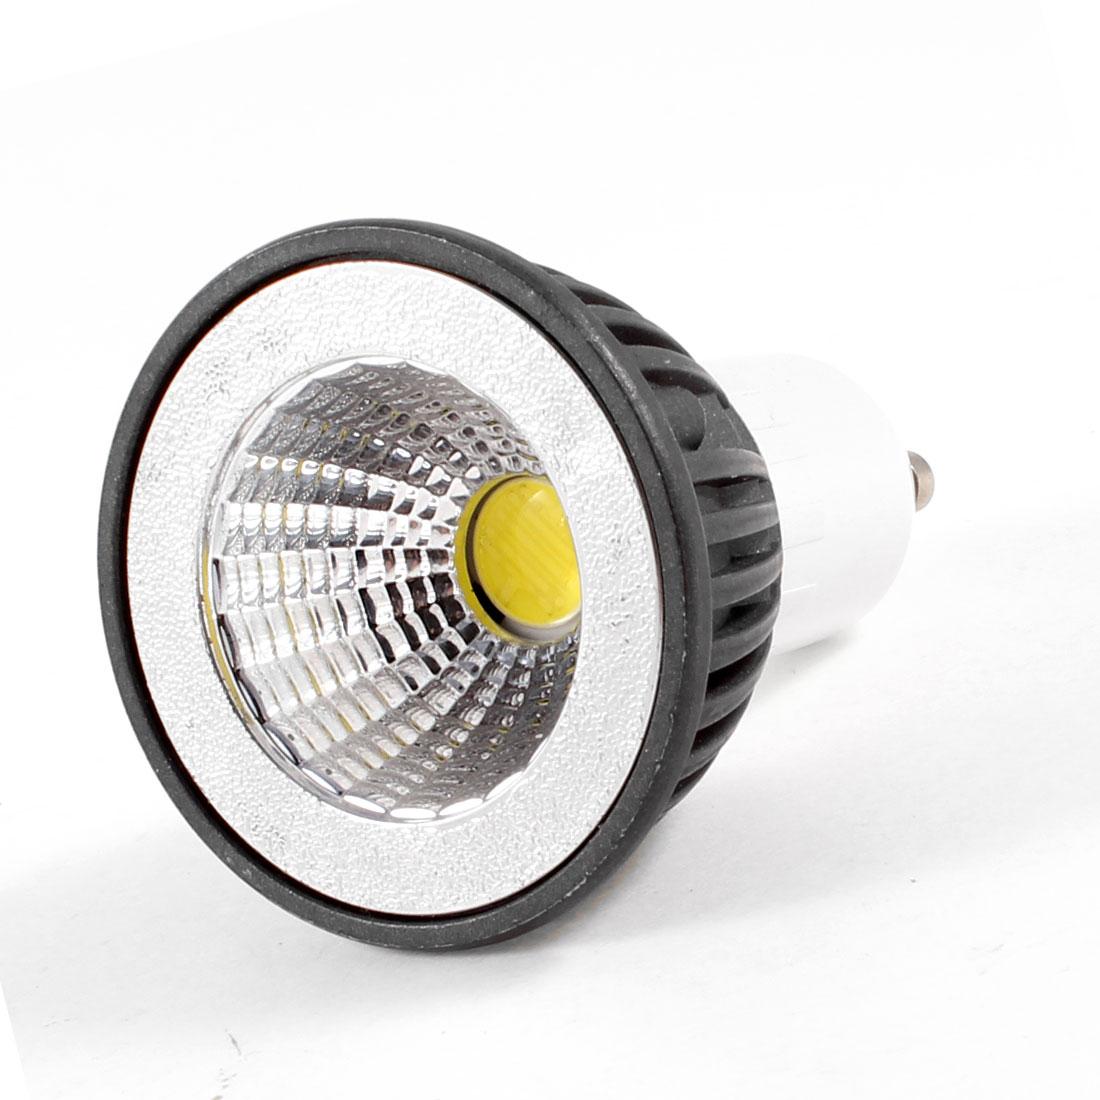 GU10 Socket LED Light Lamp Spotlight COB Cup AC 220V 5W